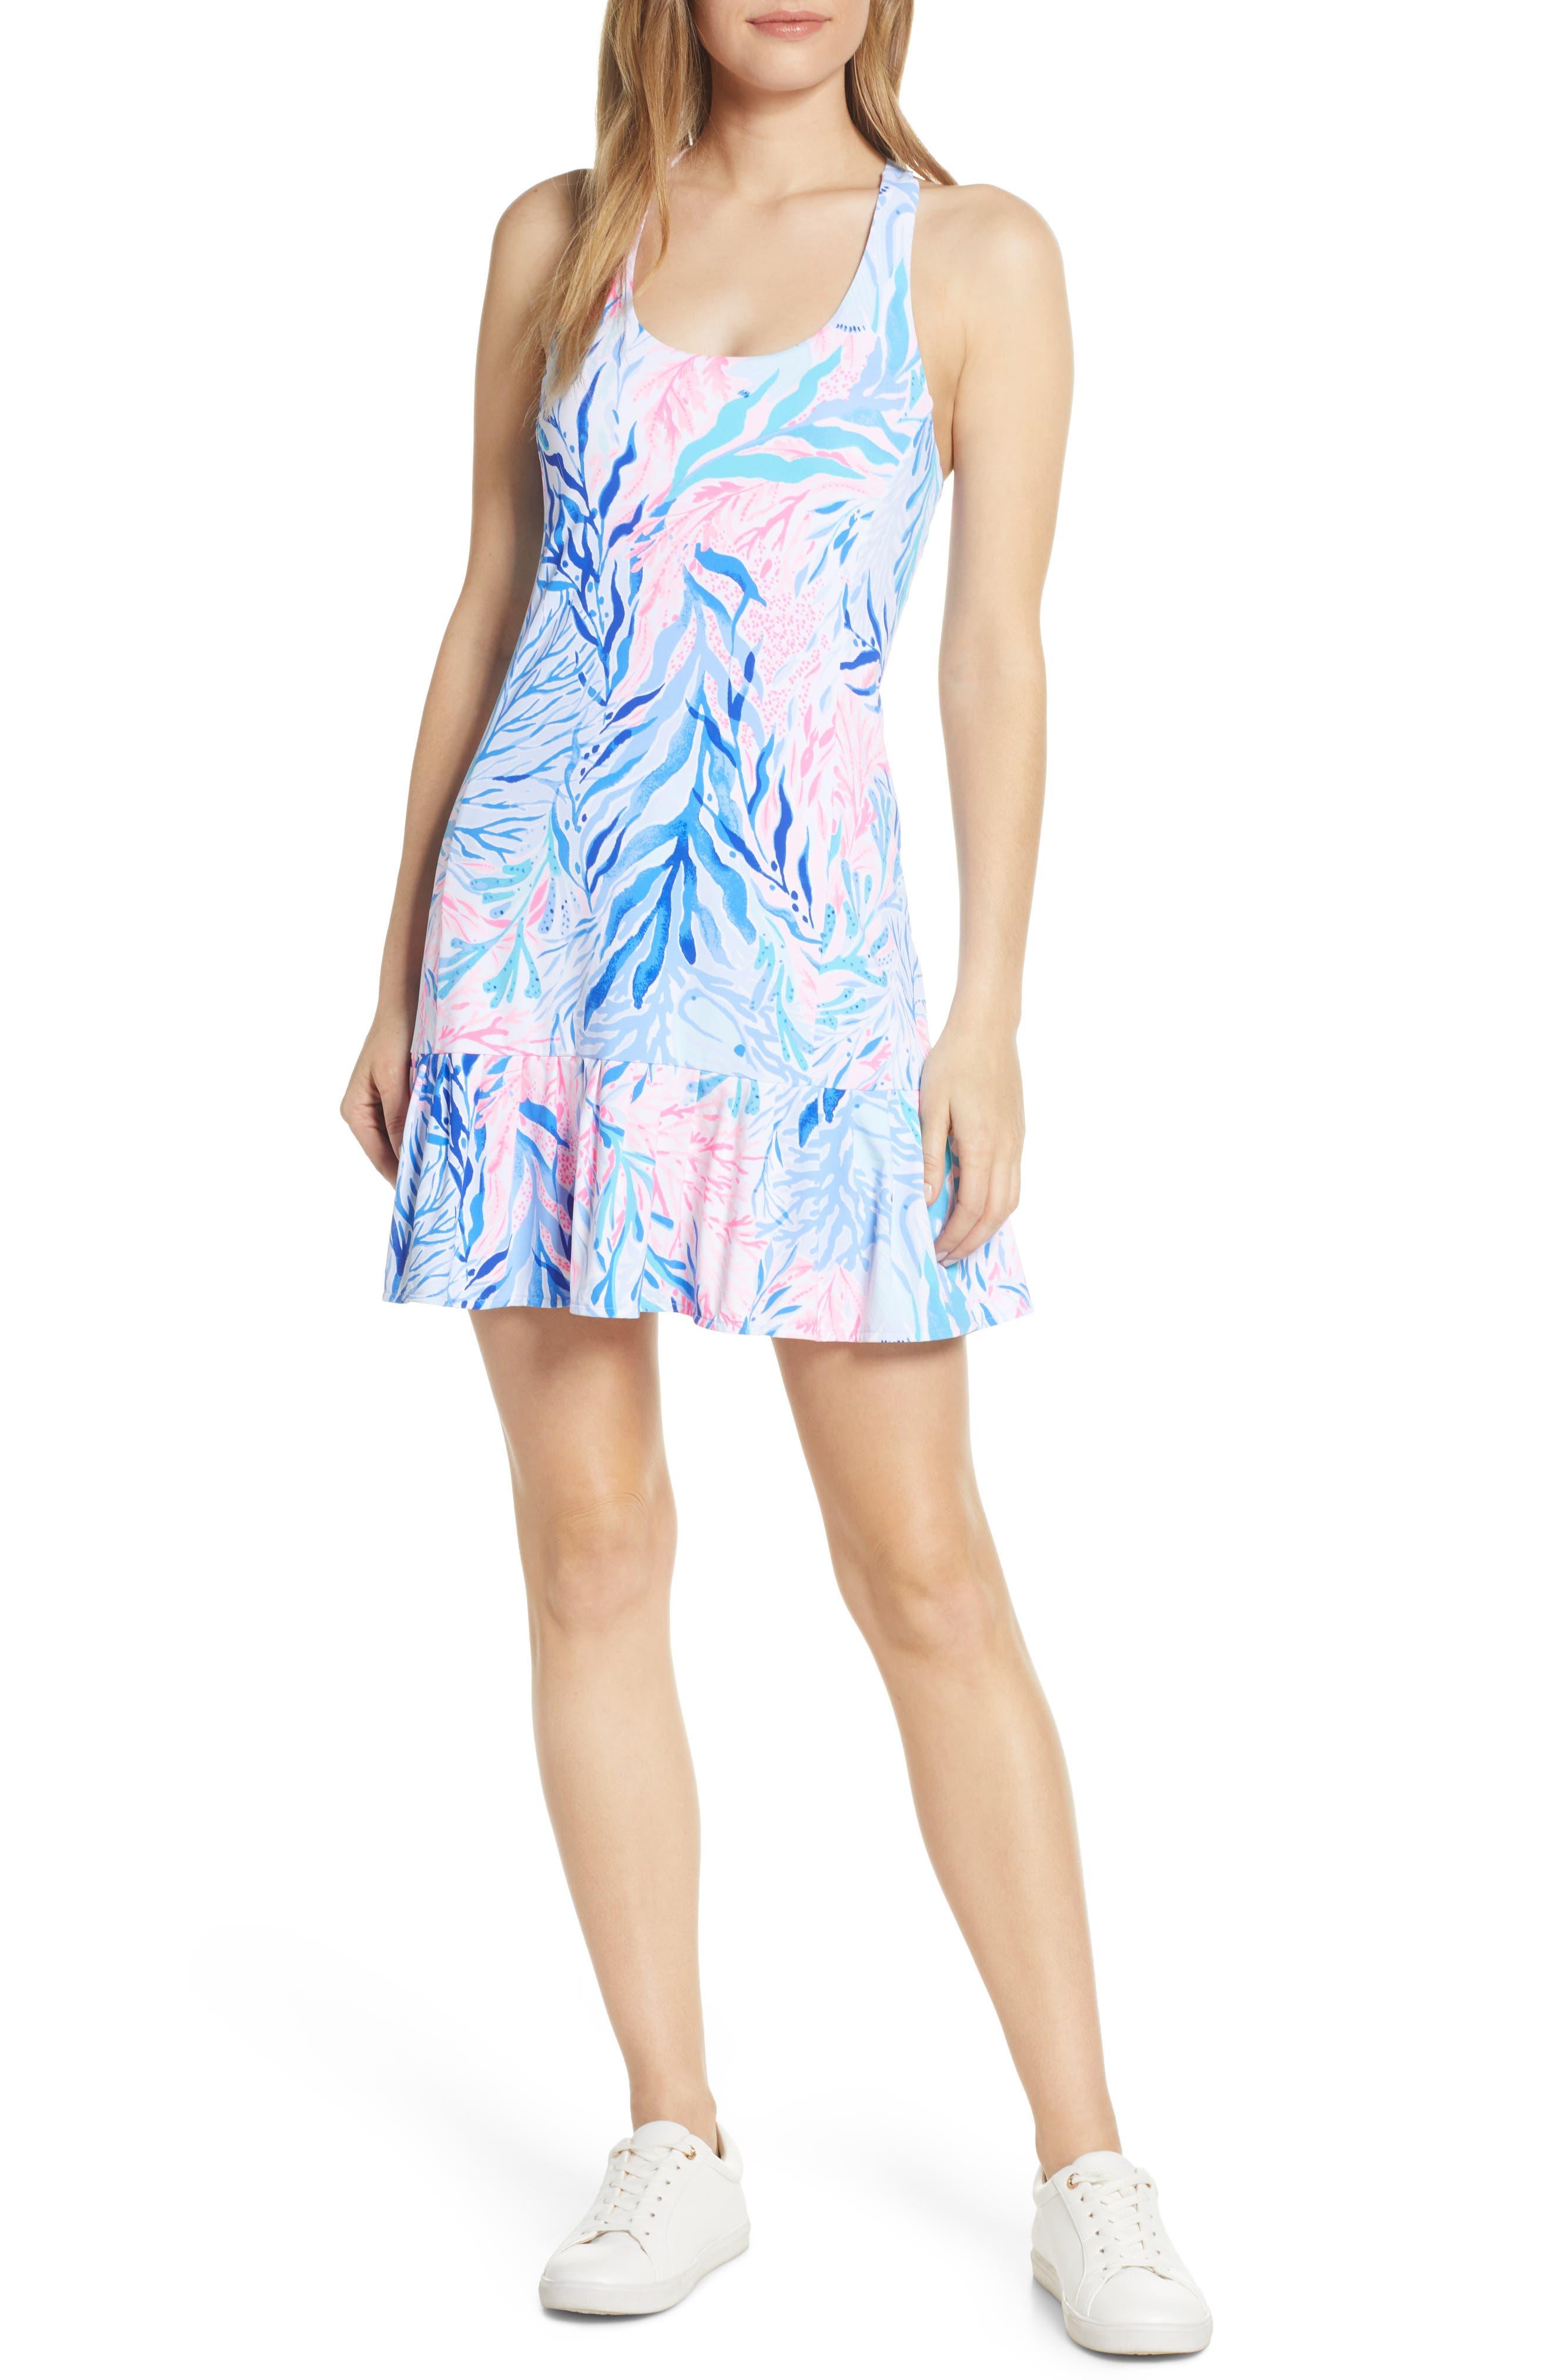 Lilly Pulitzer Luxletic Meryl Upf 50+ Ace Tennis Dress & Shorts Set, Blue